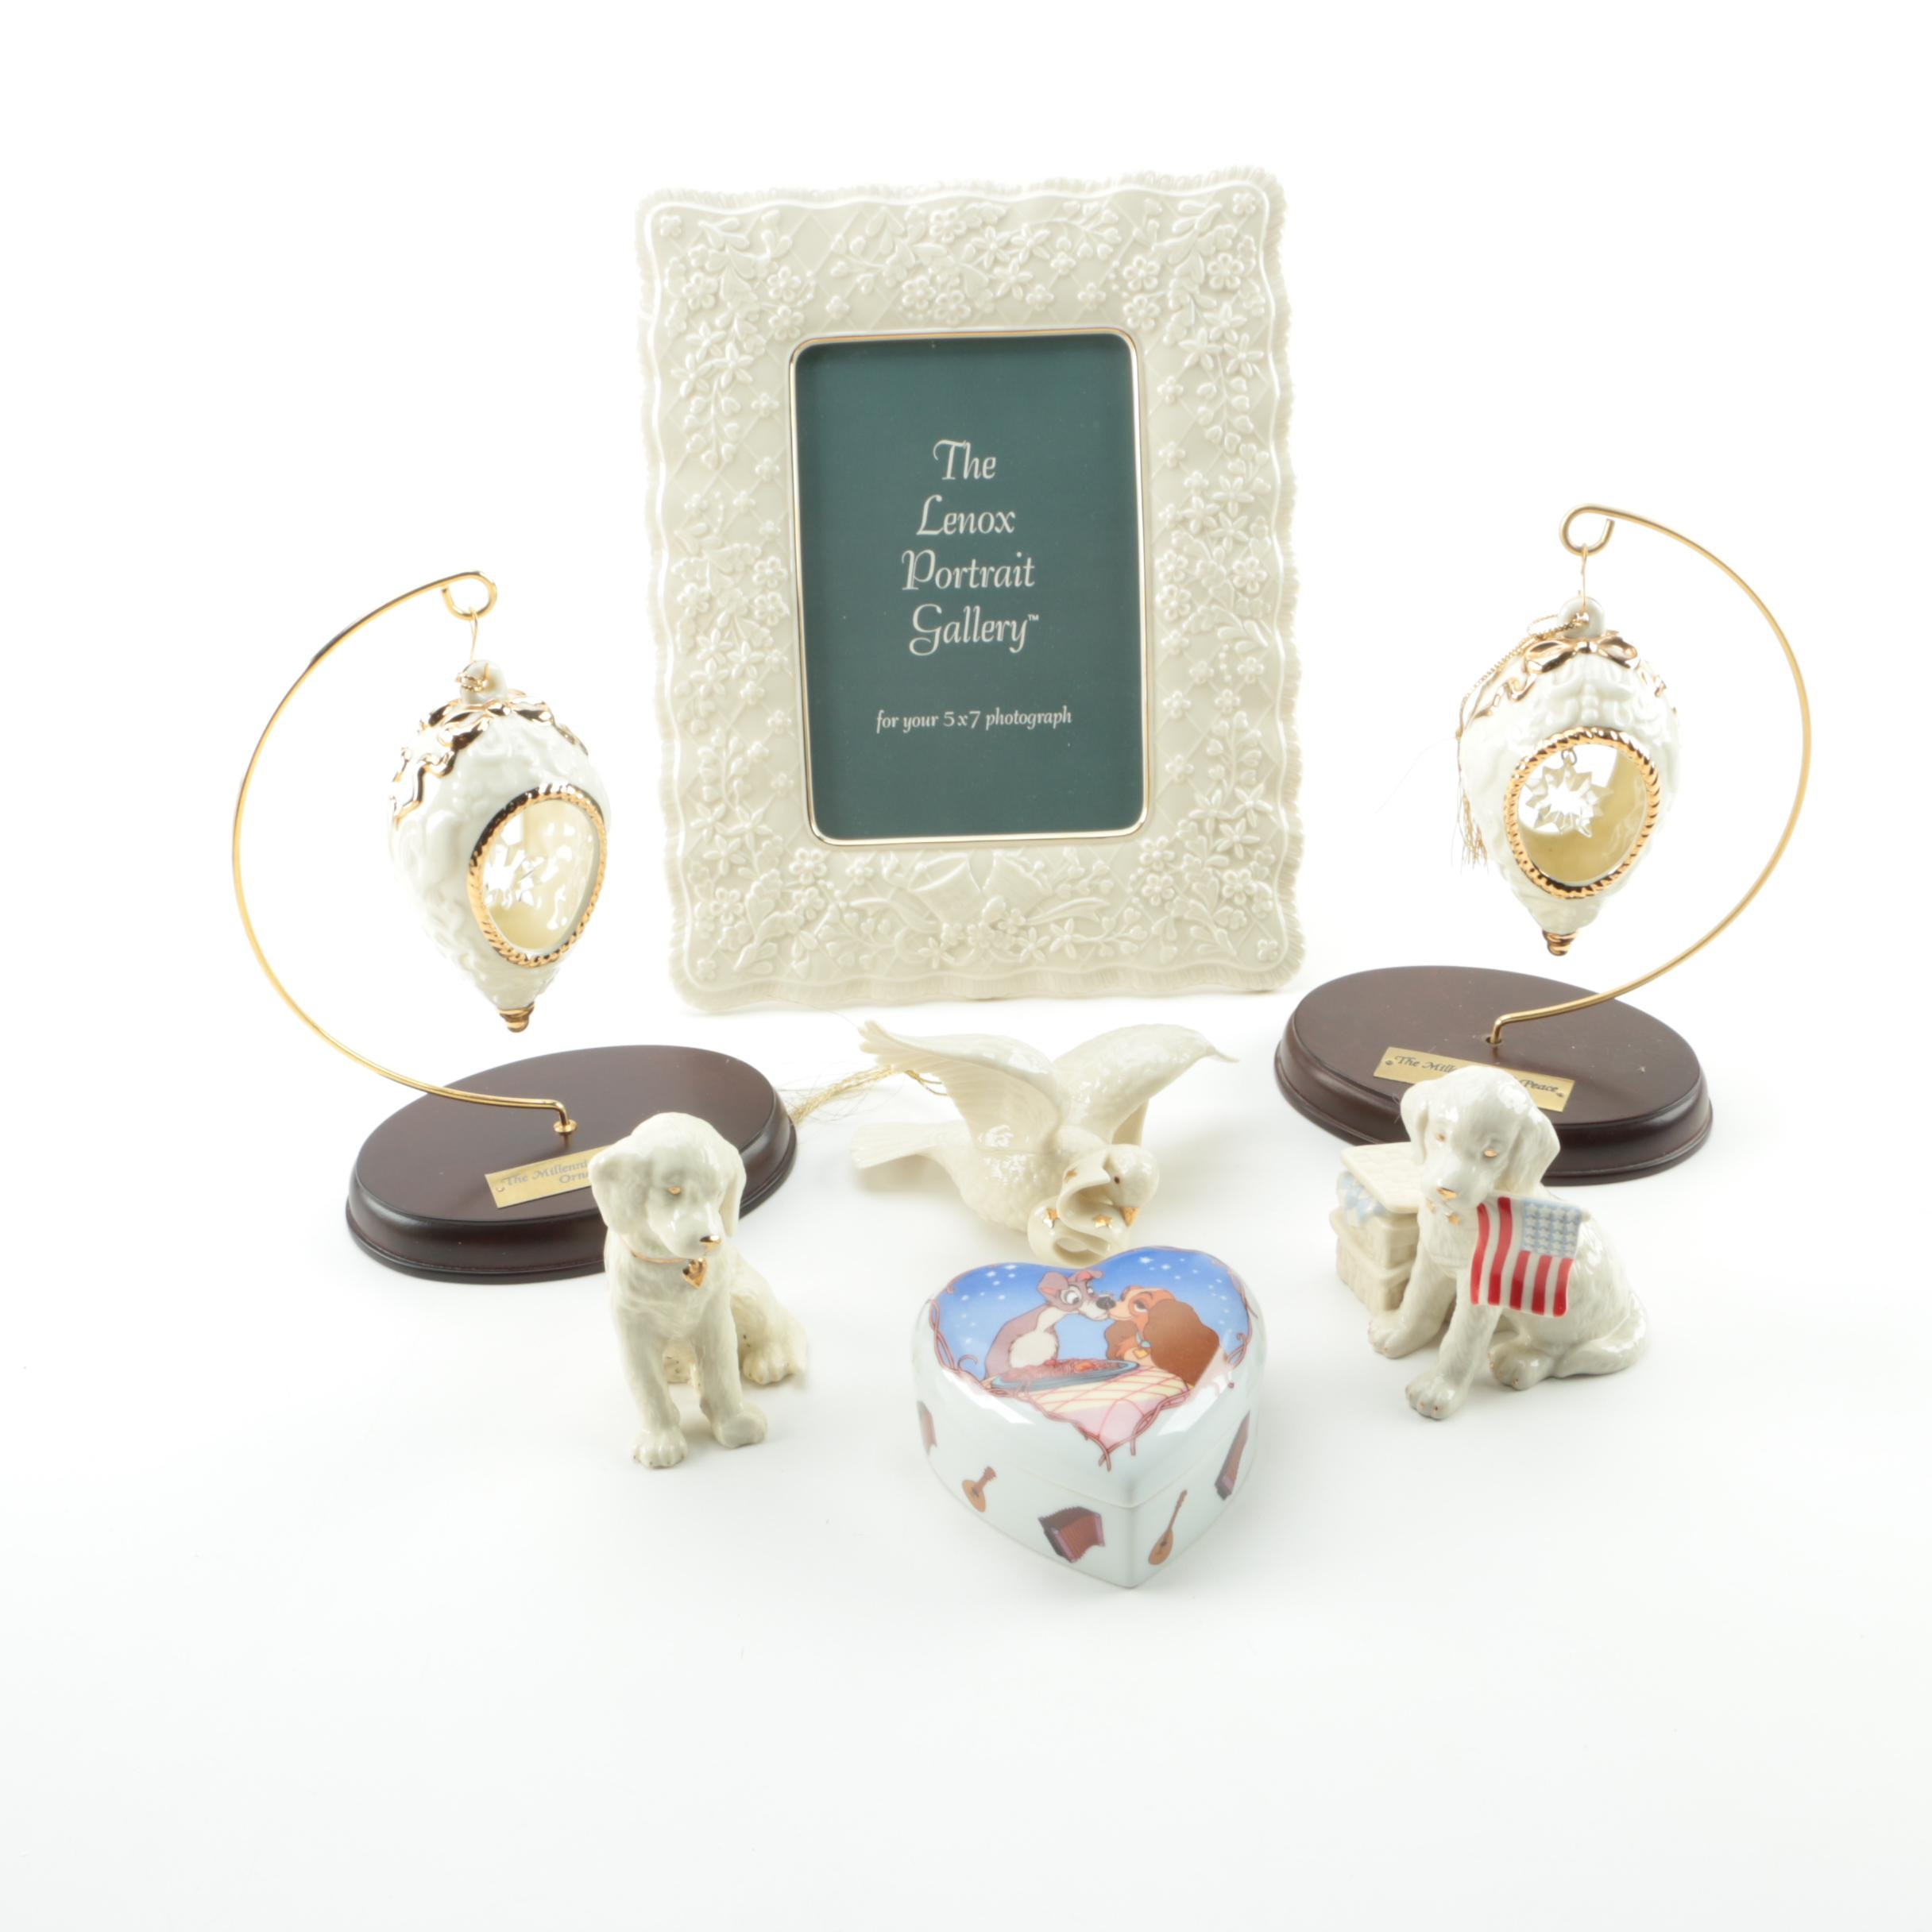 Lenox Porcelain Frame, Ornaments, Figurines, and Trinket Box